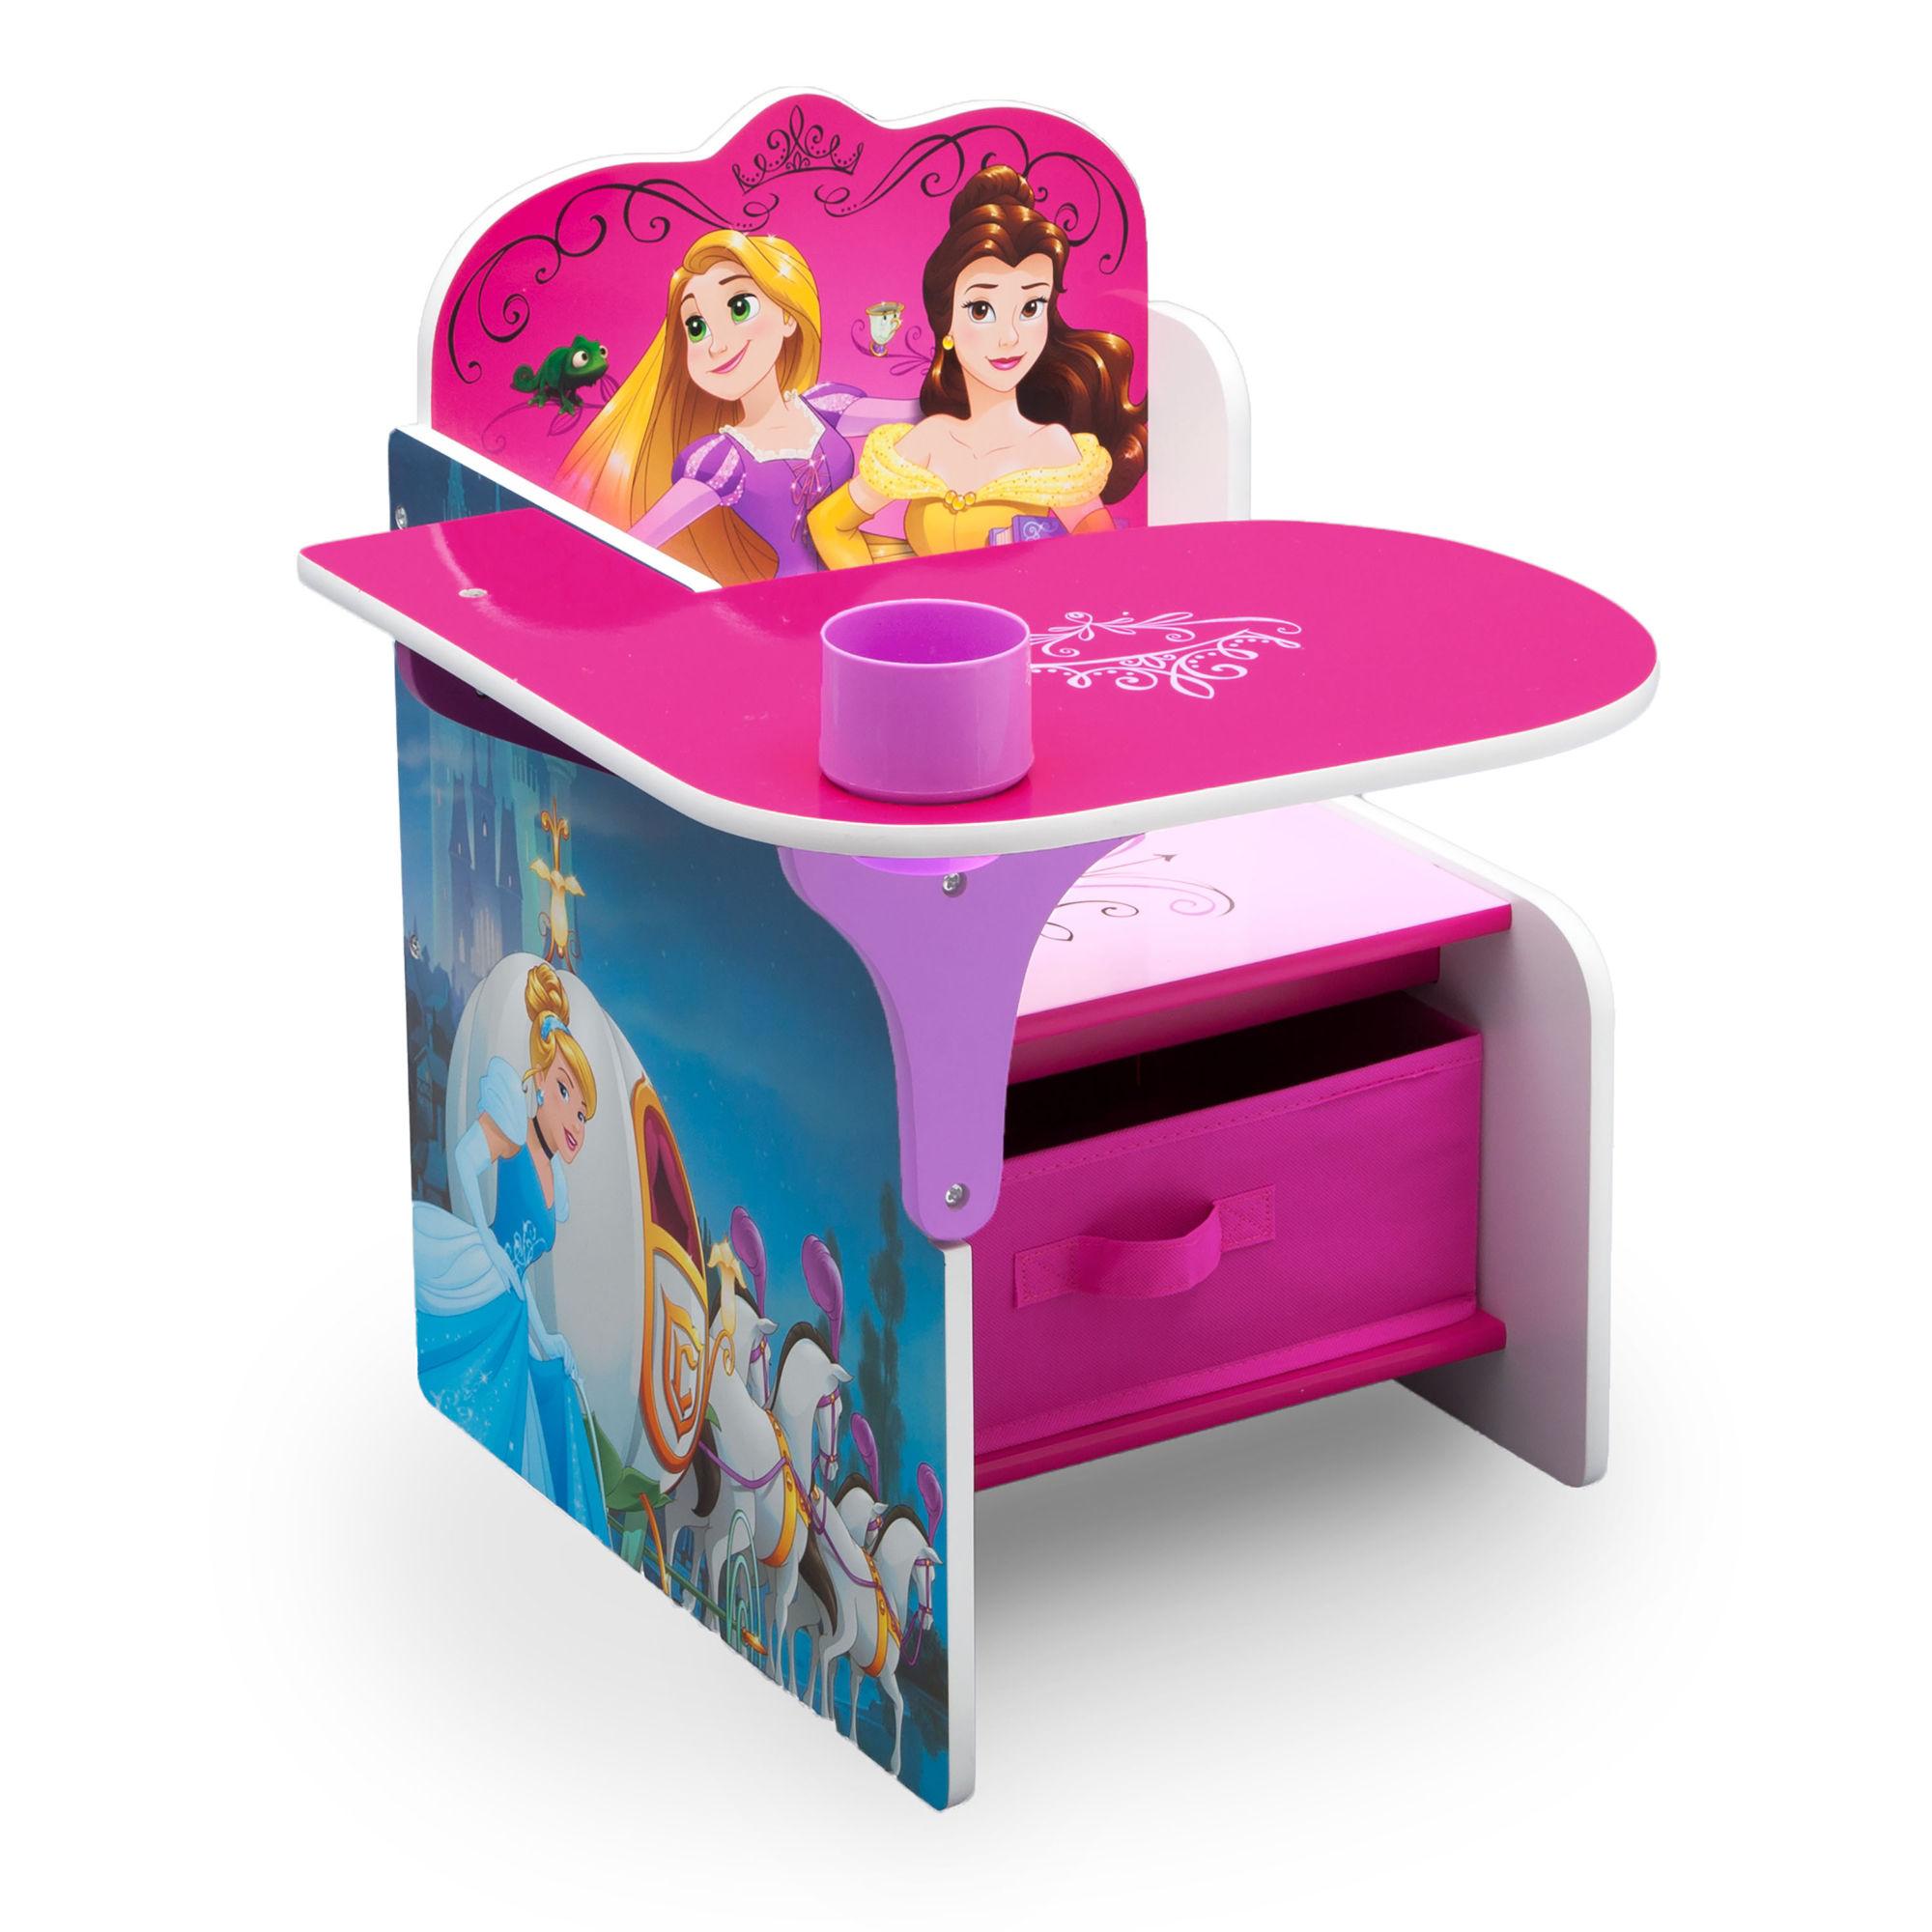 Upc 080213058227 Disney Princess Chair Desk With Storage